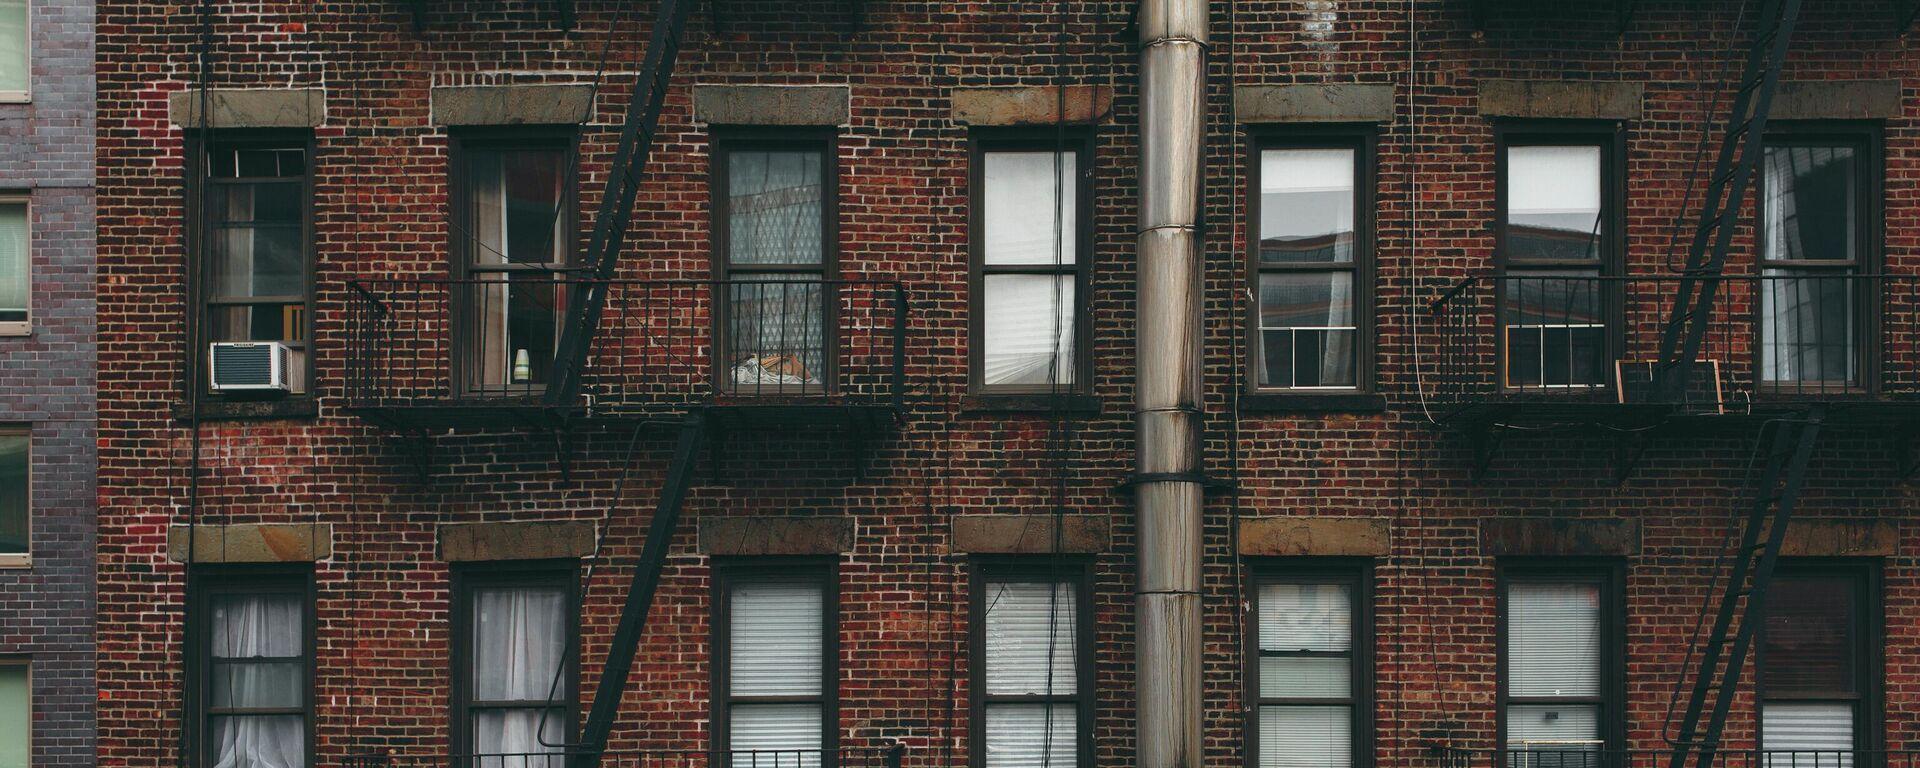 Un edificio de apartamentos, imagen ilustrativa - Sputnik Mundo, 1920, 16.02.2021